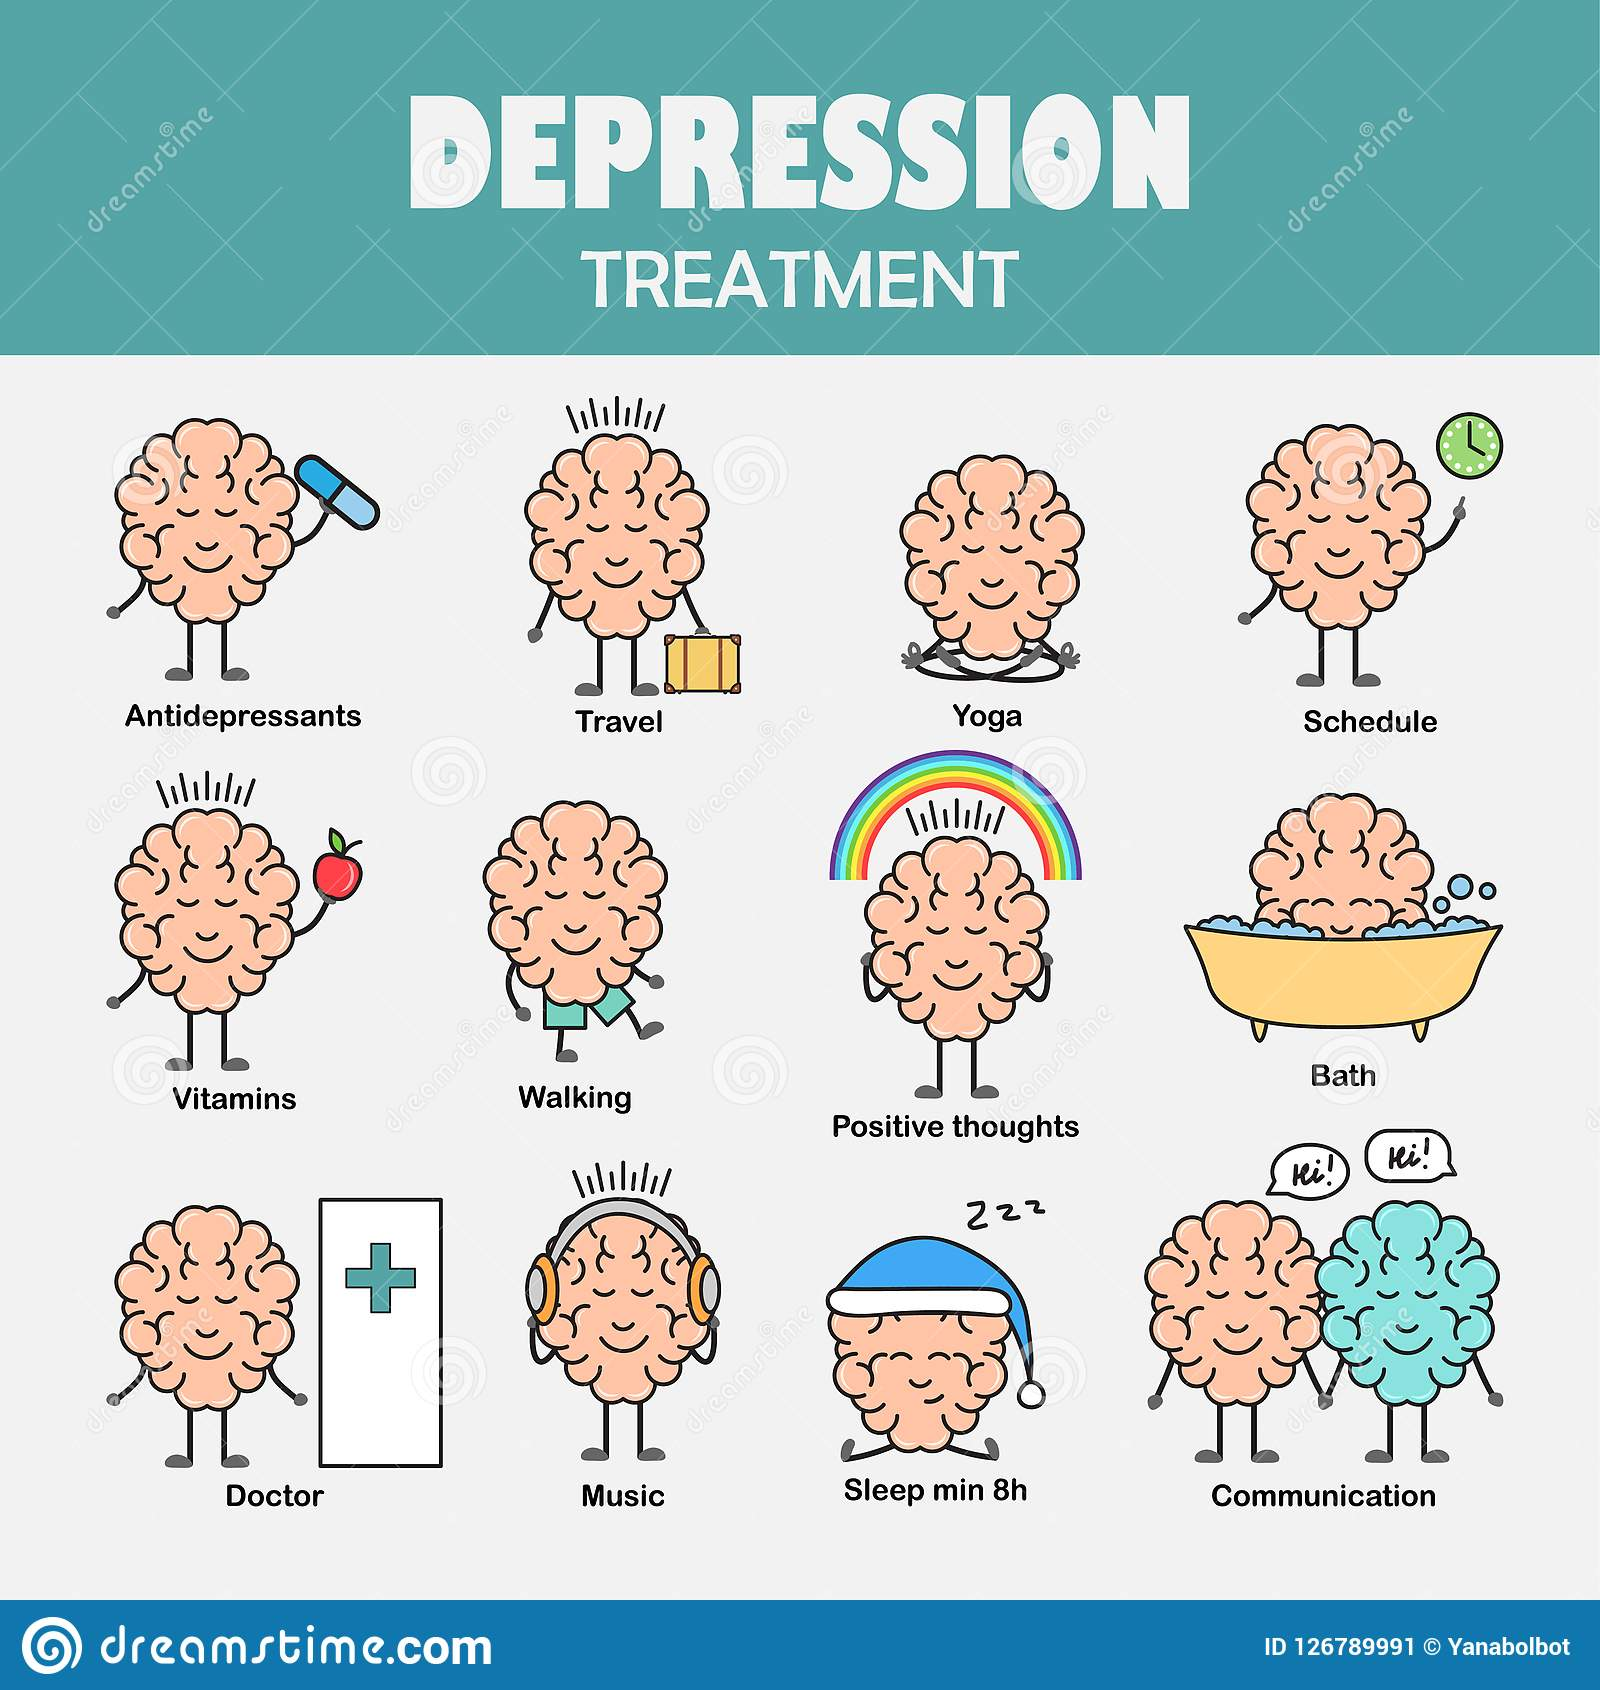 Depression treatment. Cartoon brain character